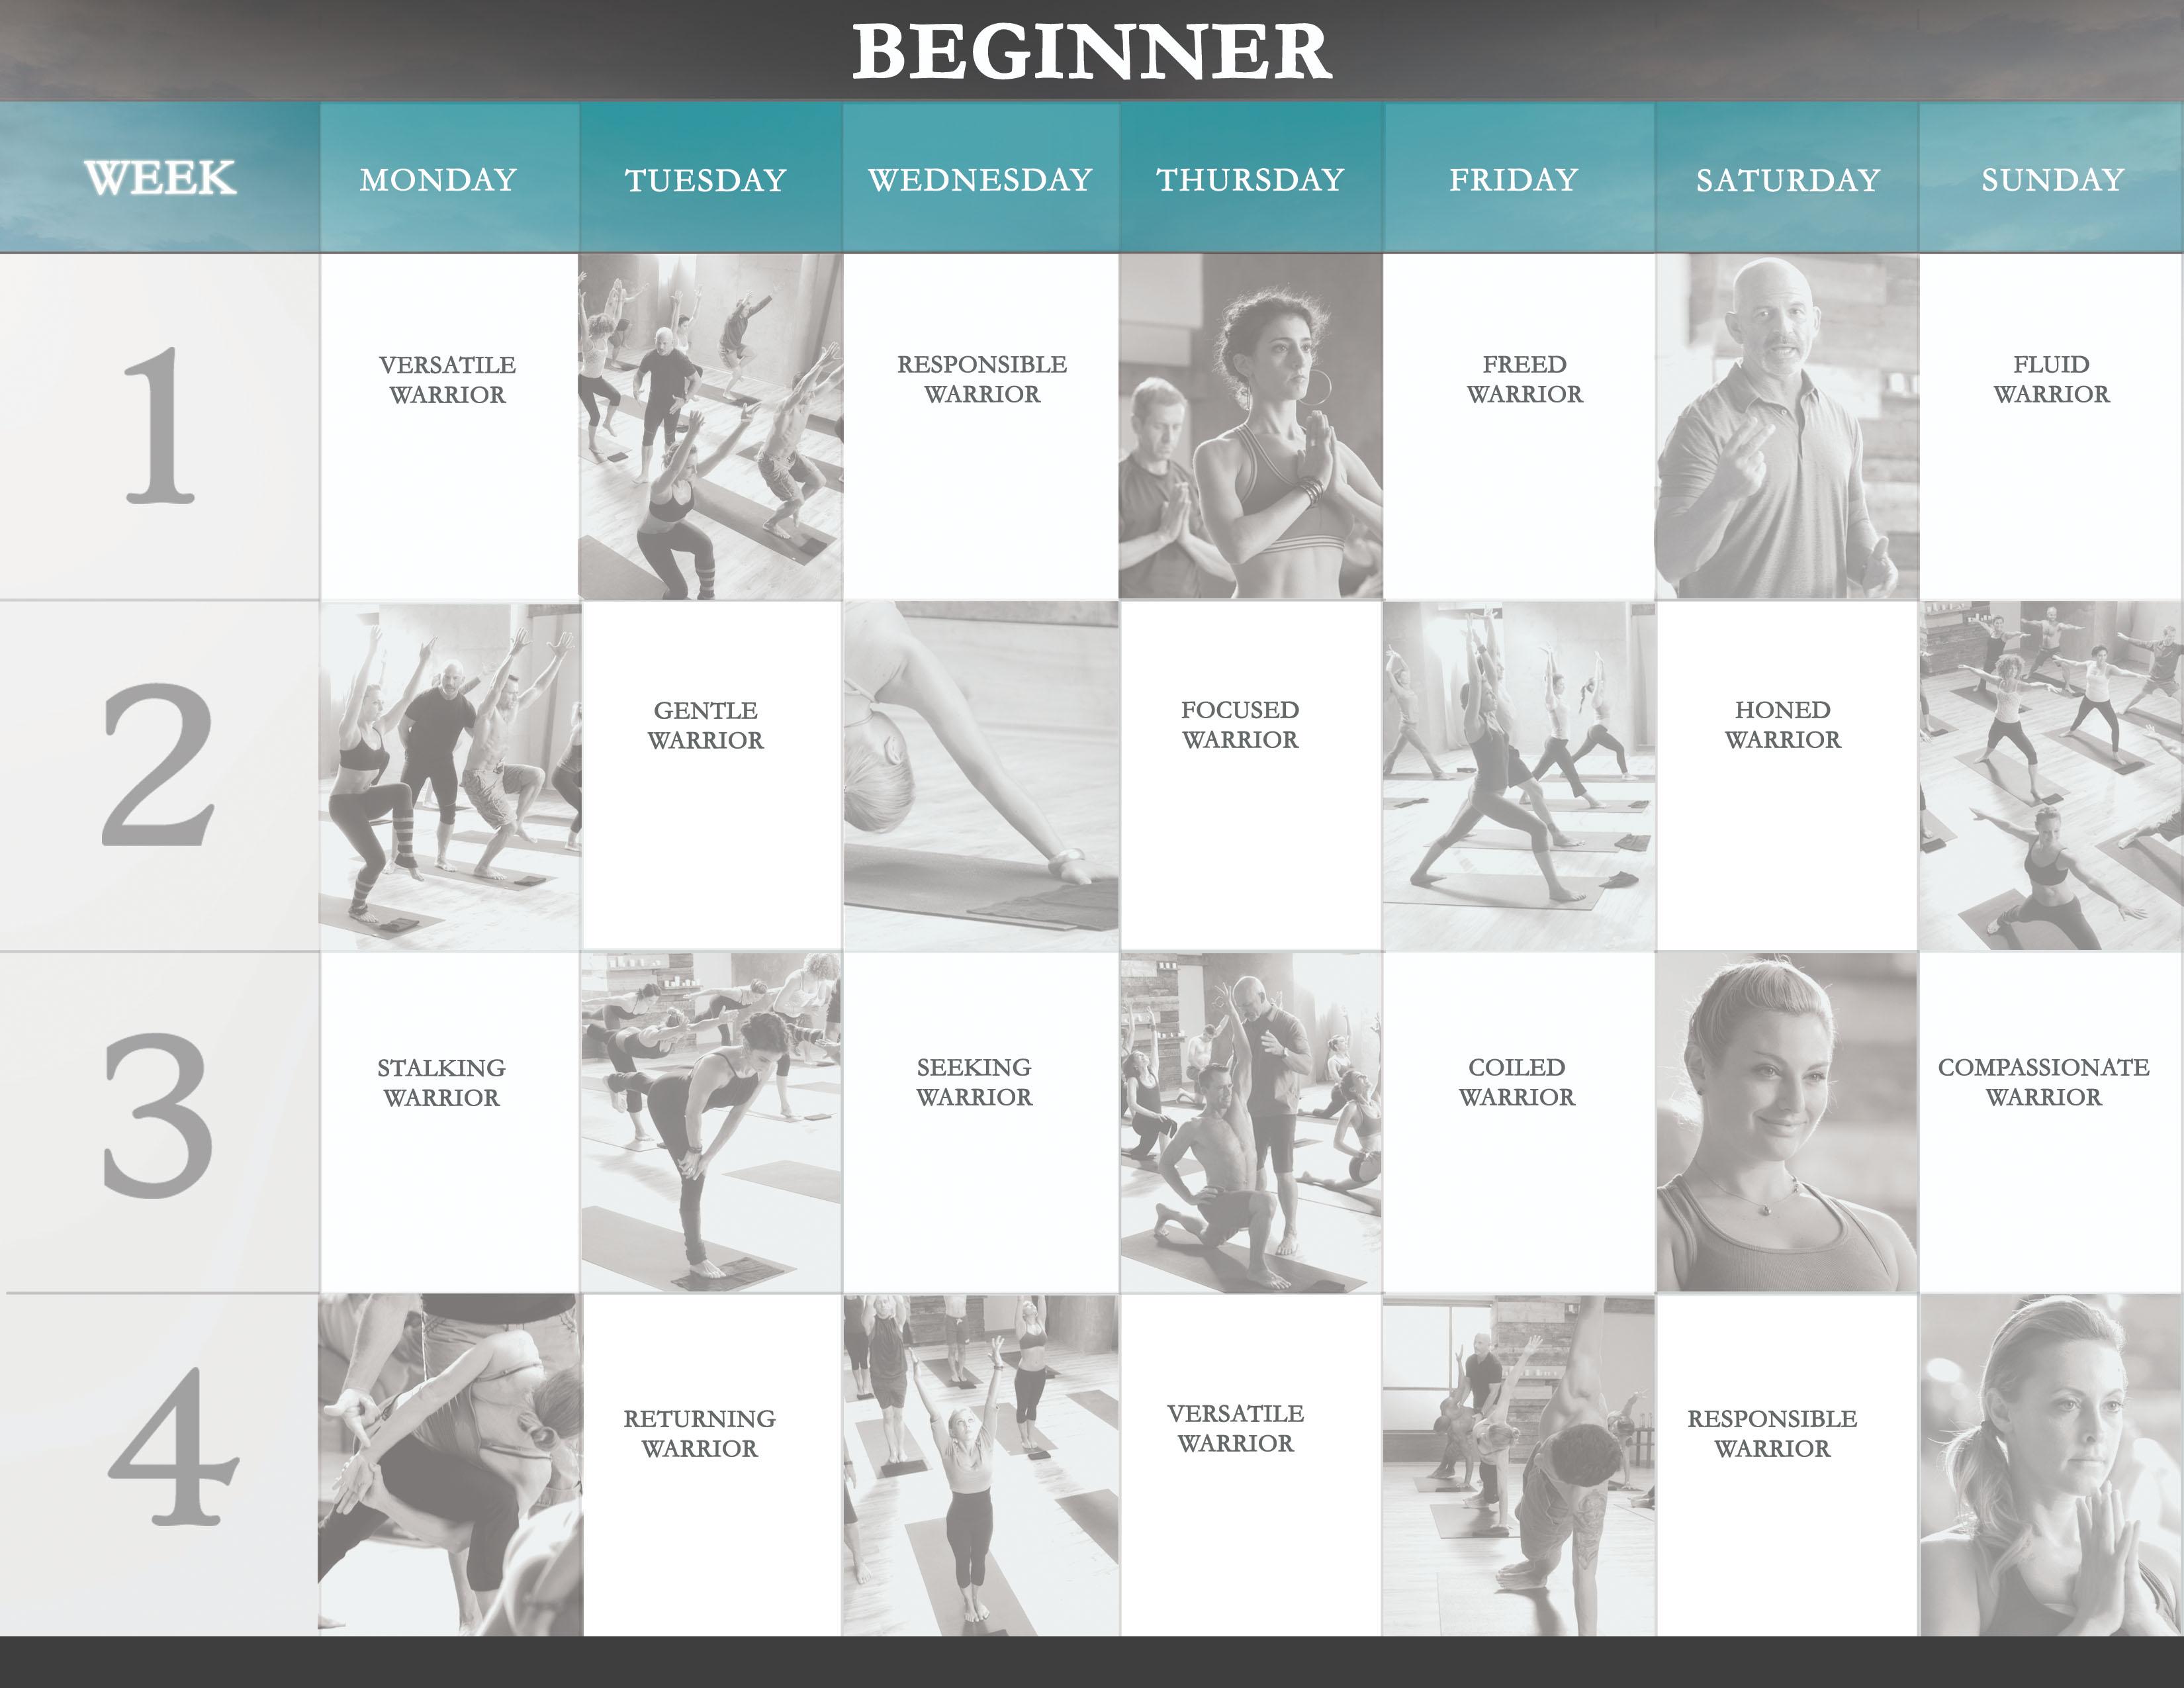 YW_beginner_cal-1